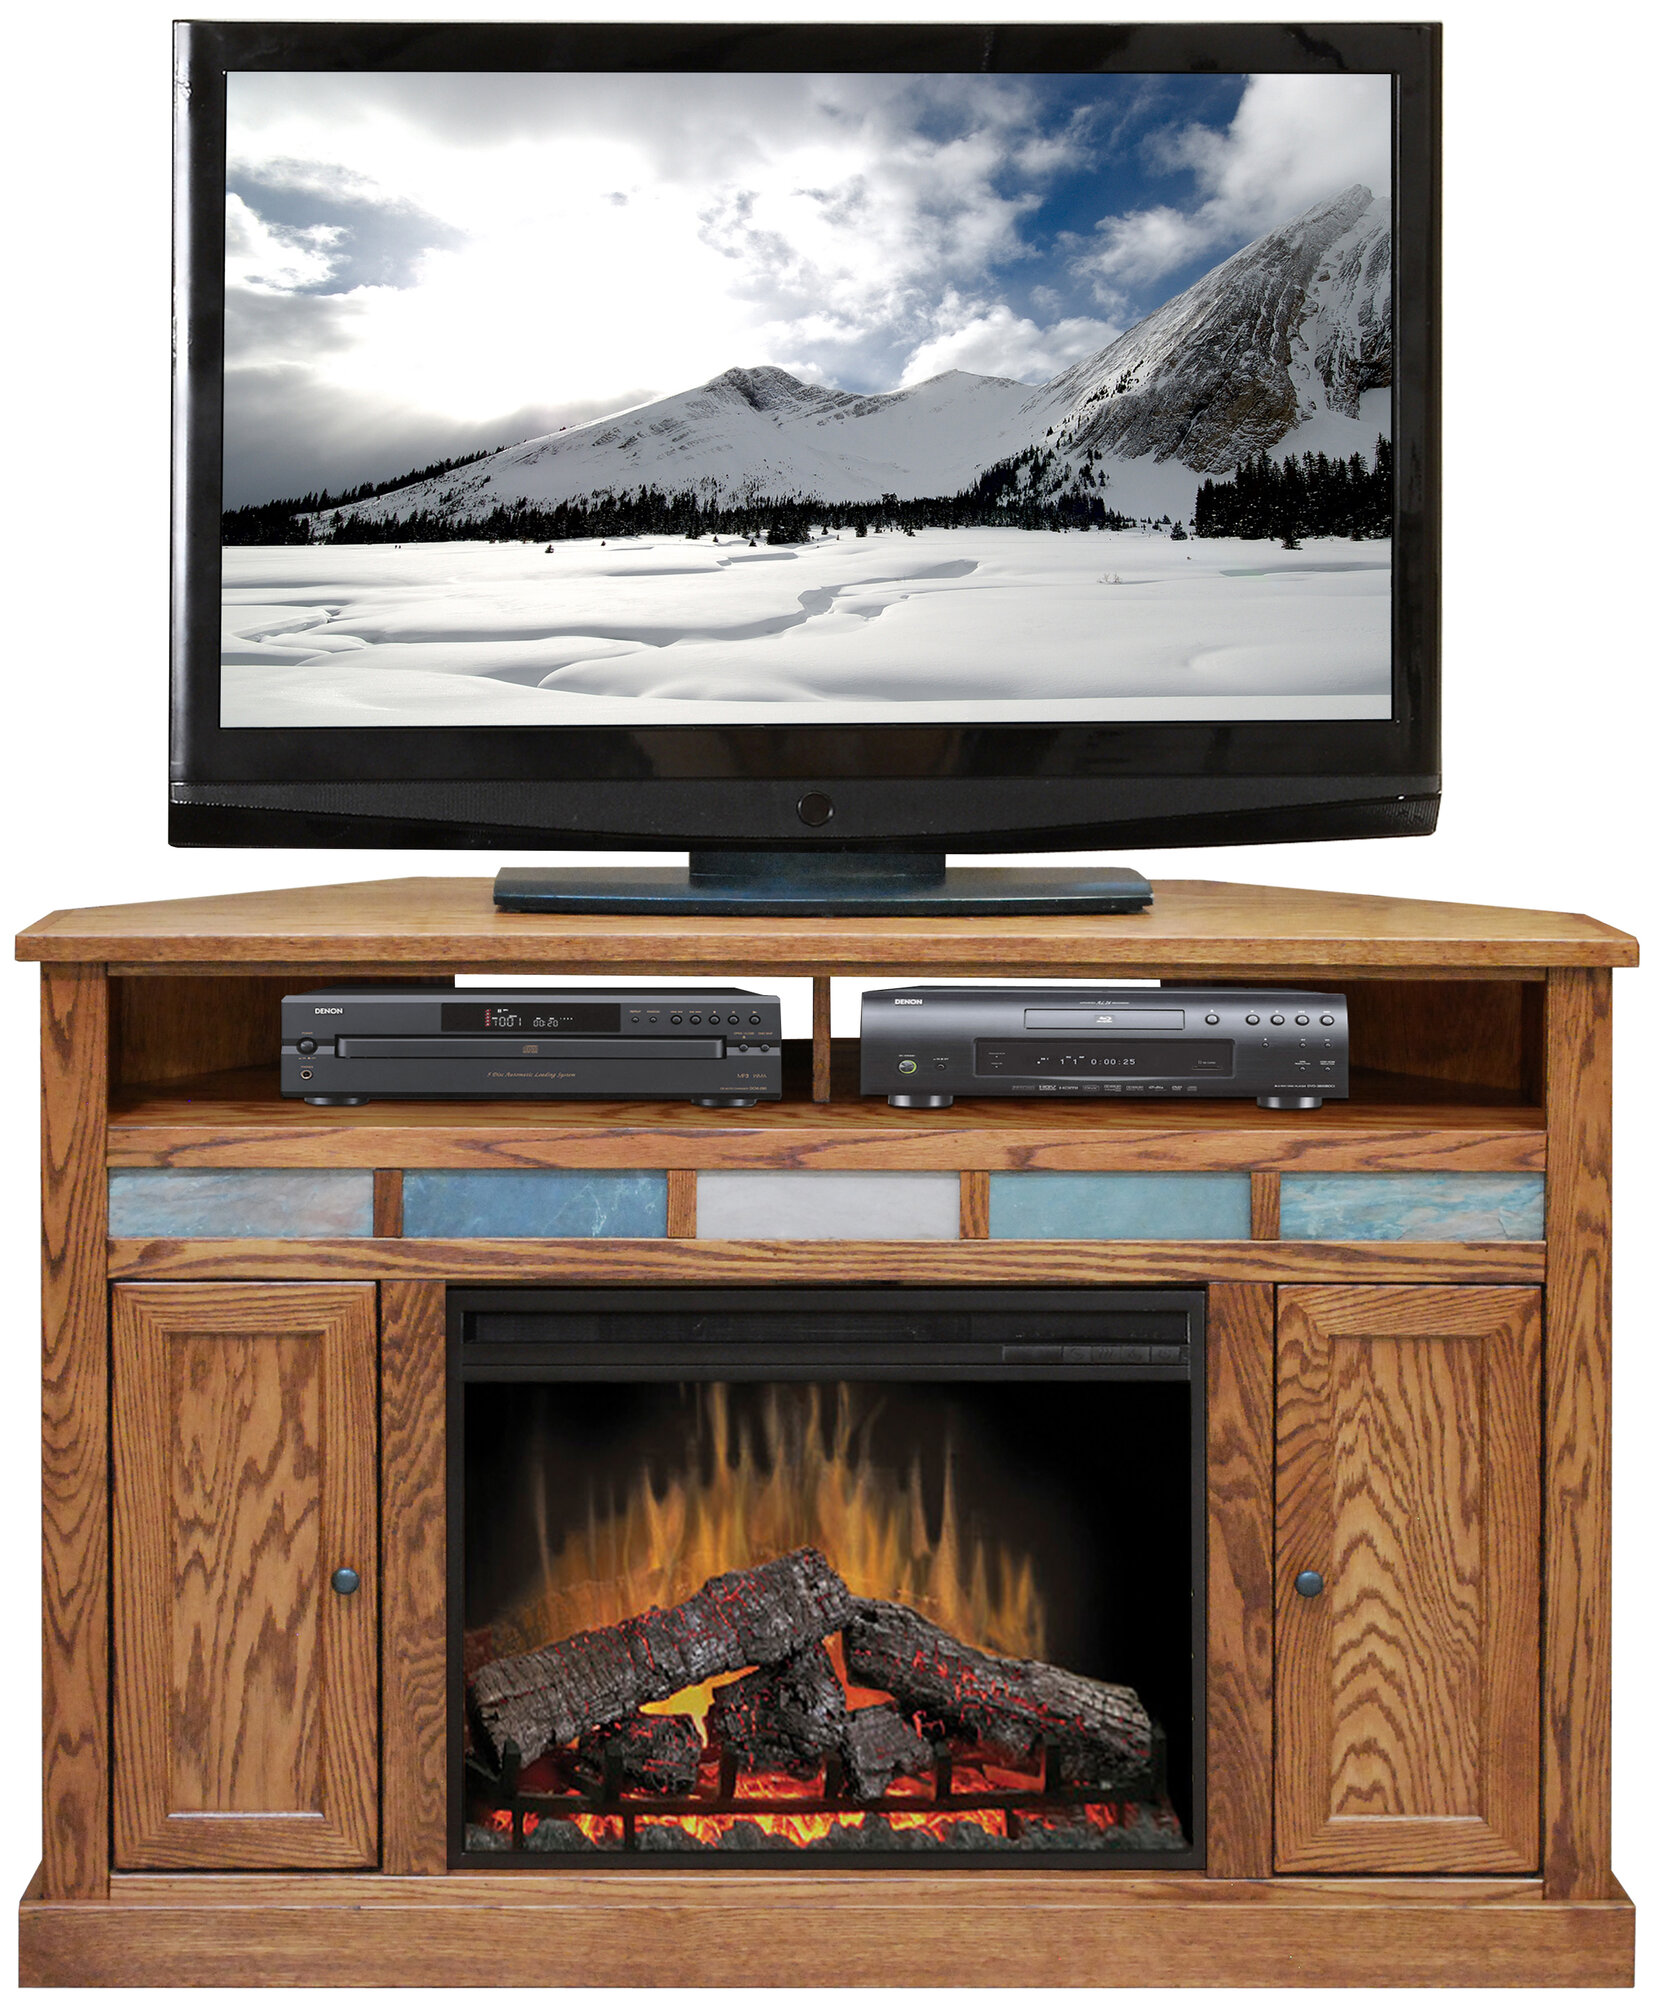 legends furniture oak creek tv stand with electric fireplace ebay. Black Bedroom Furniture Sets. Home Design Ideas